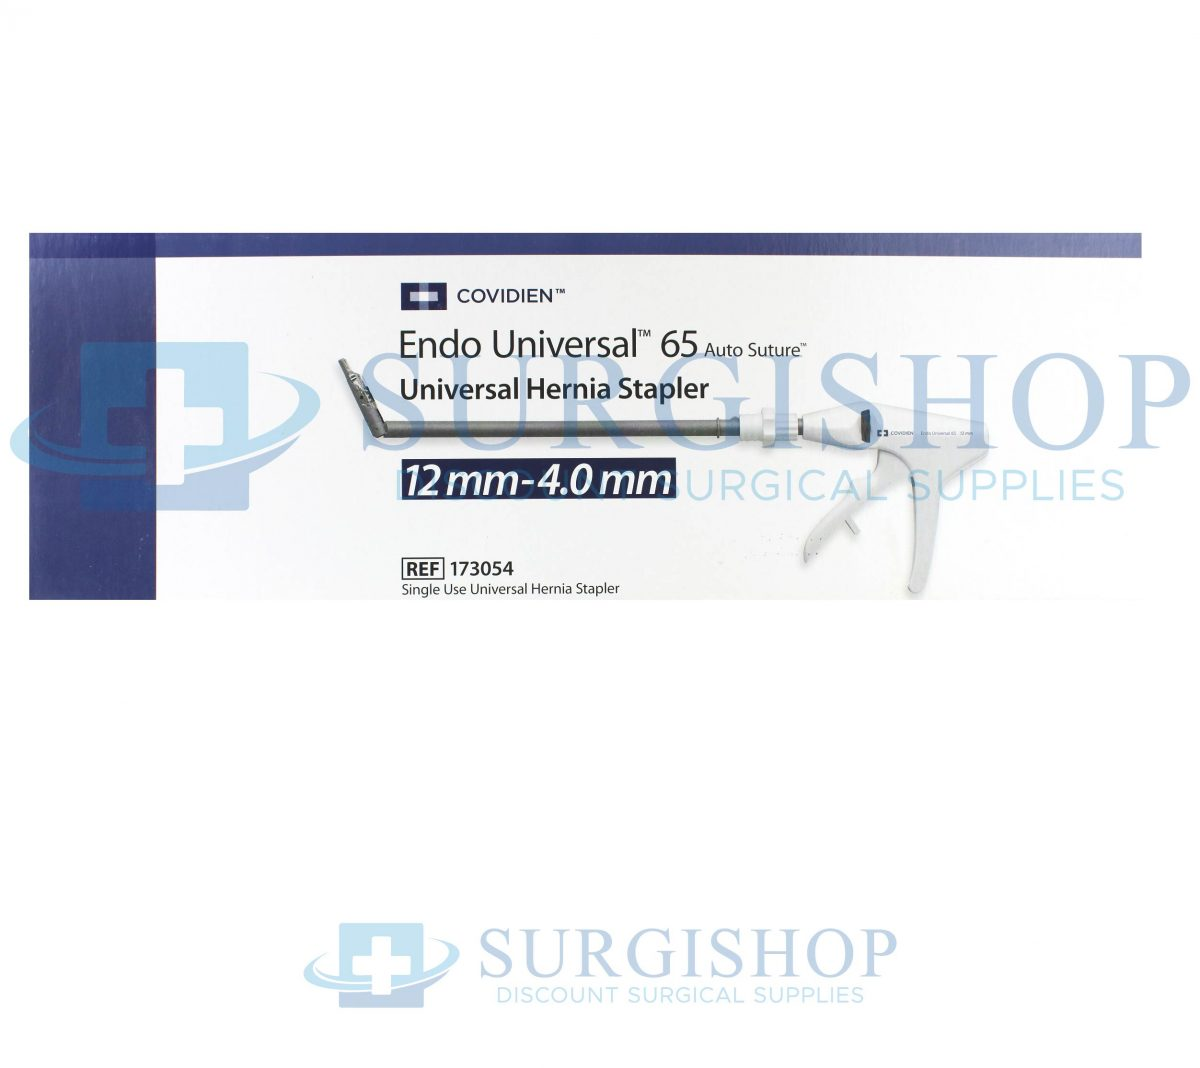 Covidien Endo Universal 65 Universal Hernia Stapler 12.0mm x 4.0mm